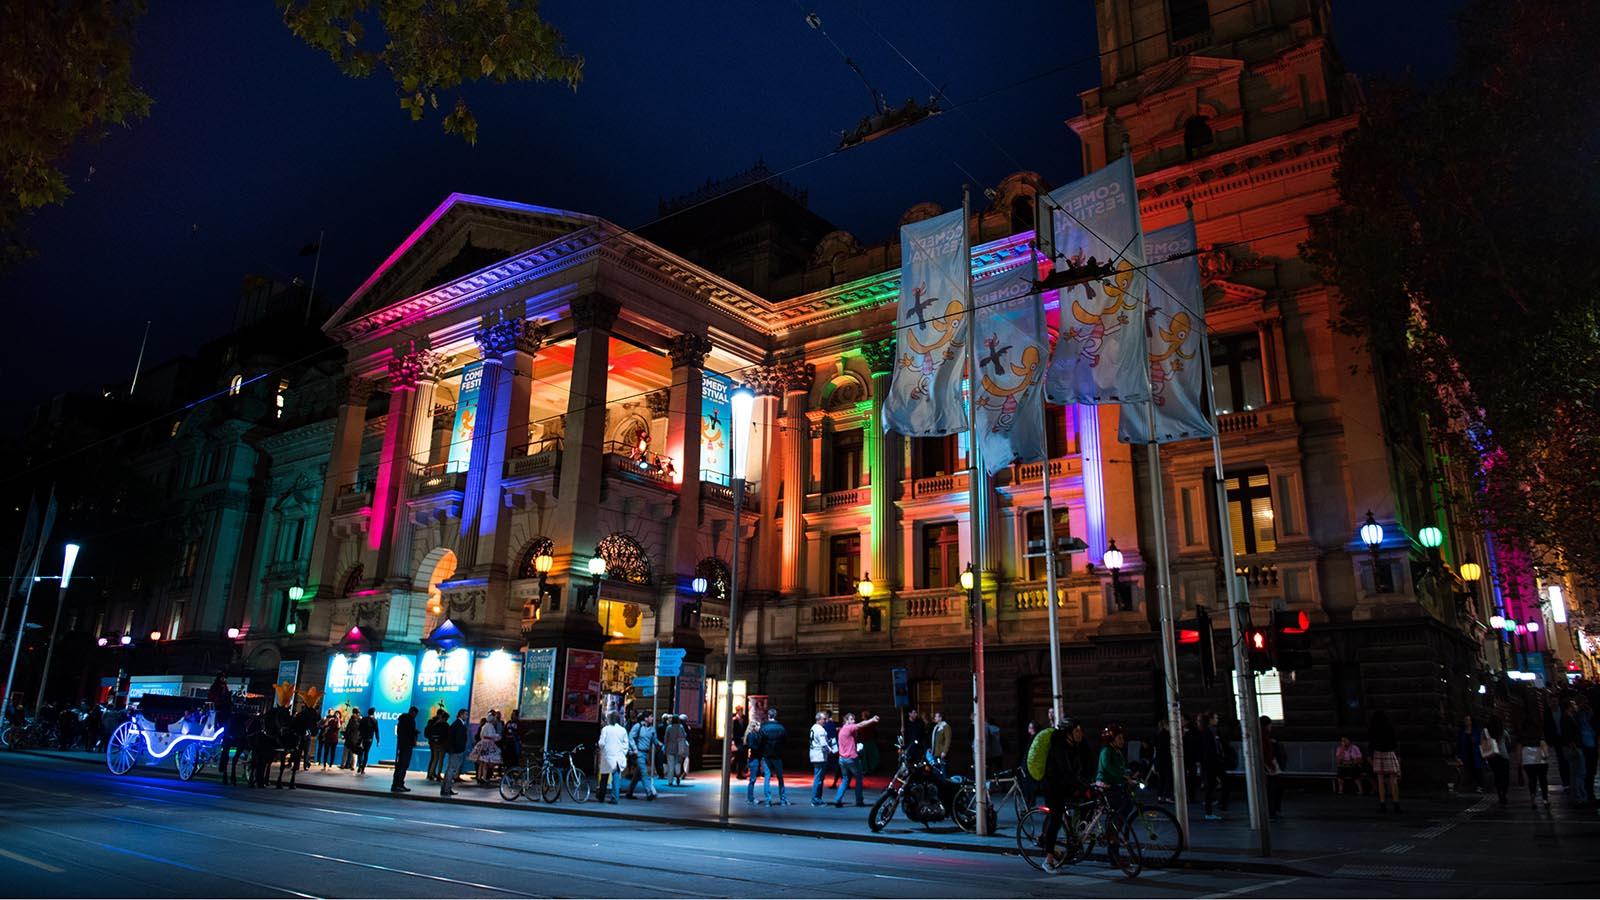 Melbourne International Comedy Festival, Melbourne, Victoria, Australia